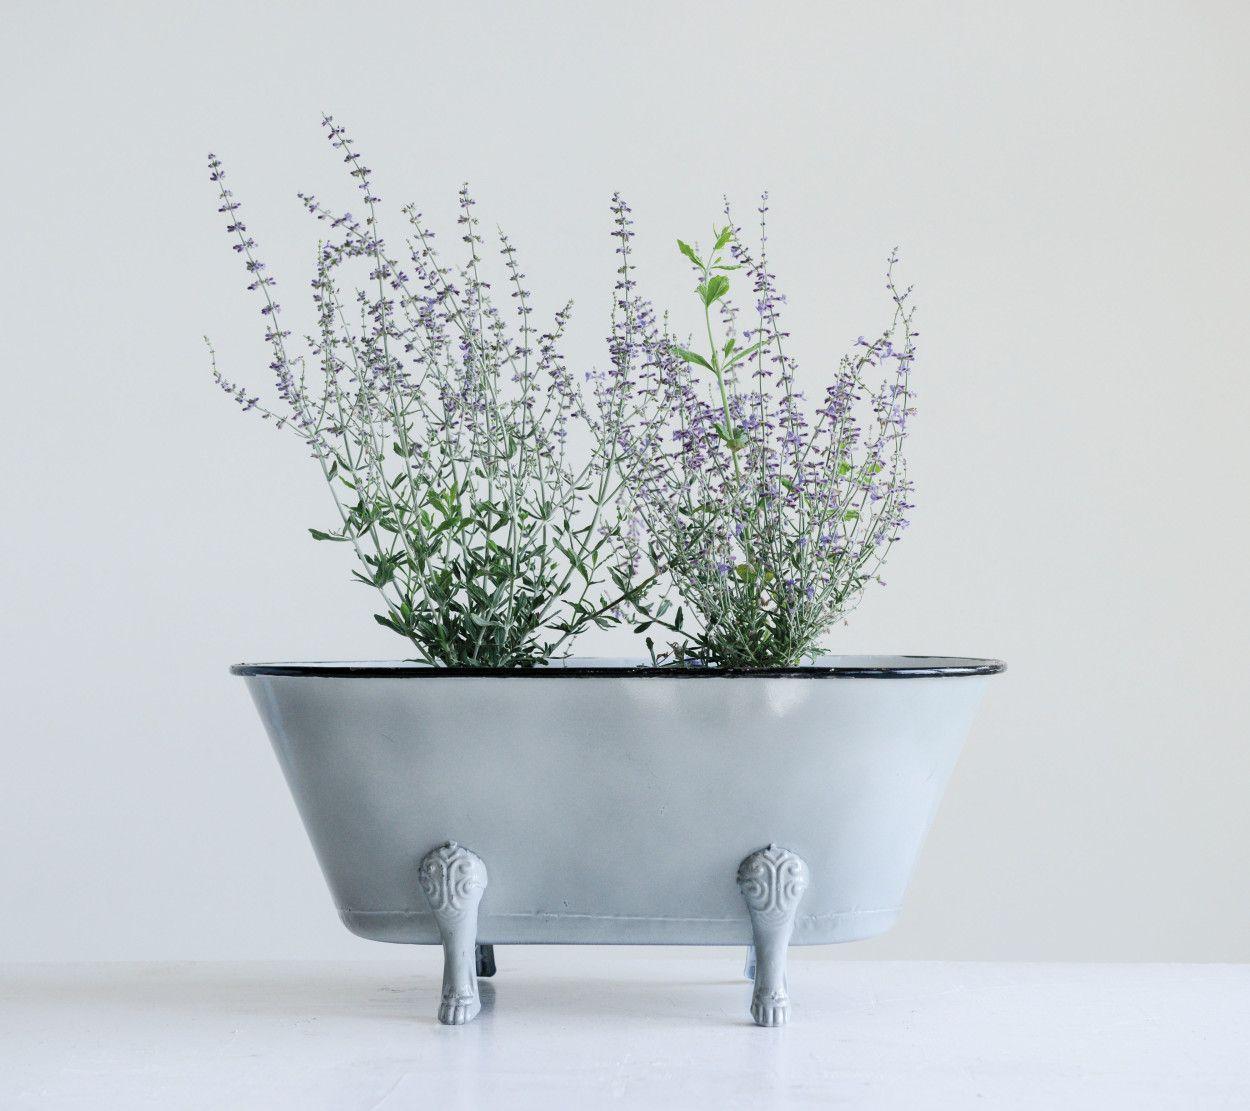 decorative grey metal bathtub